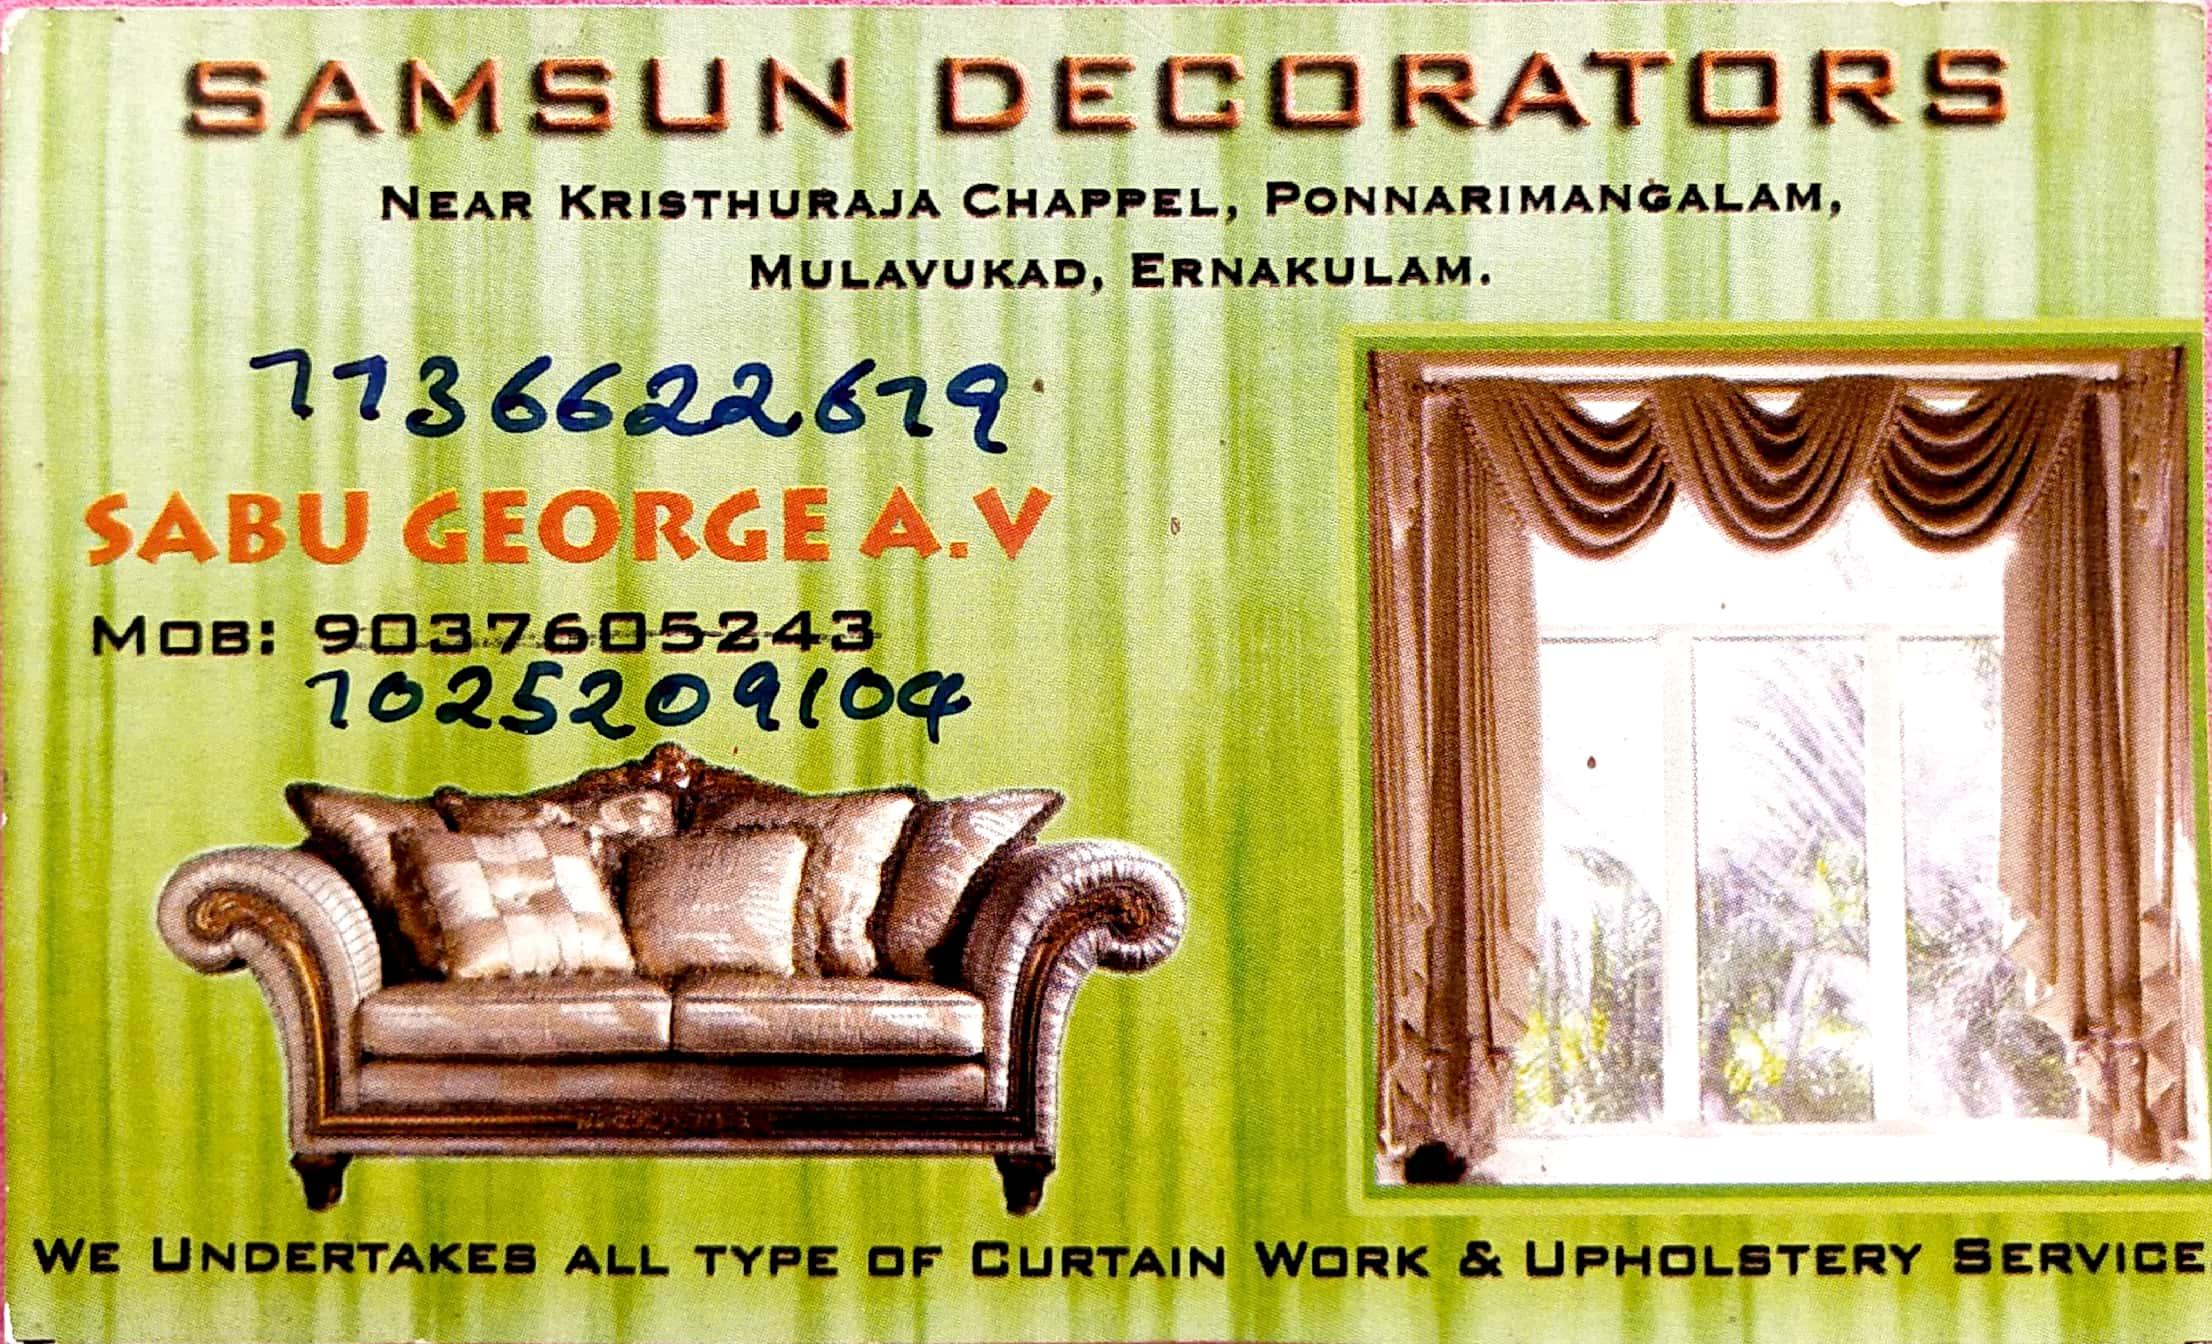 SAMSUN DECORATIONS, UPHOLSTERY WORKS,  service in Eranakulam, Ernakulam